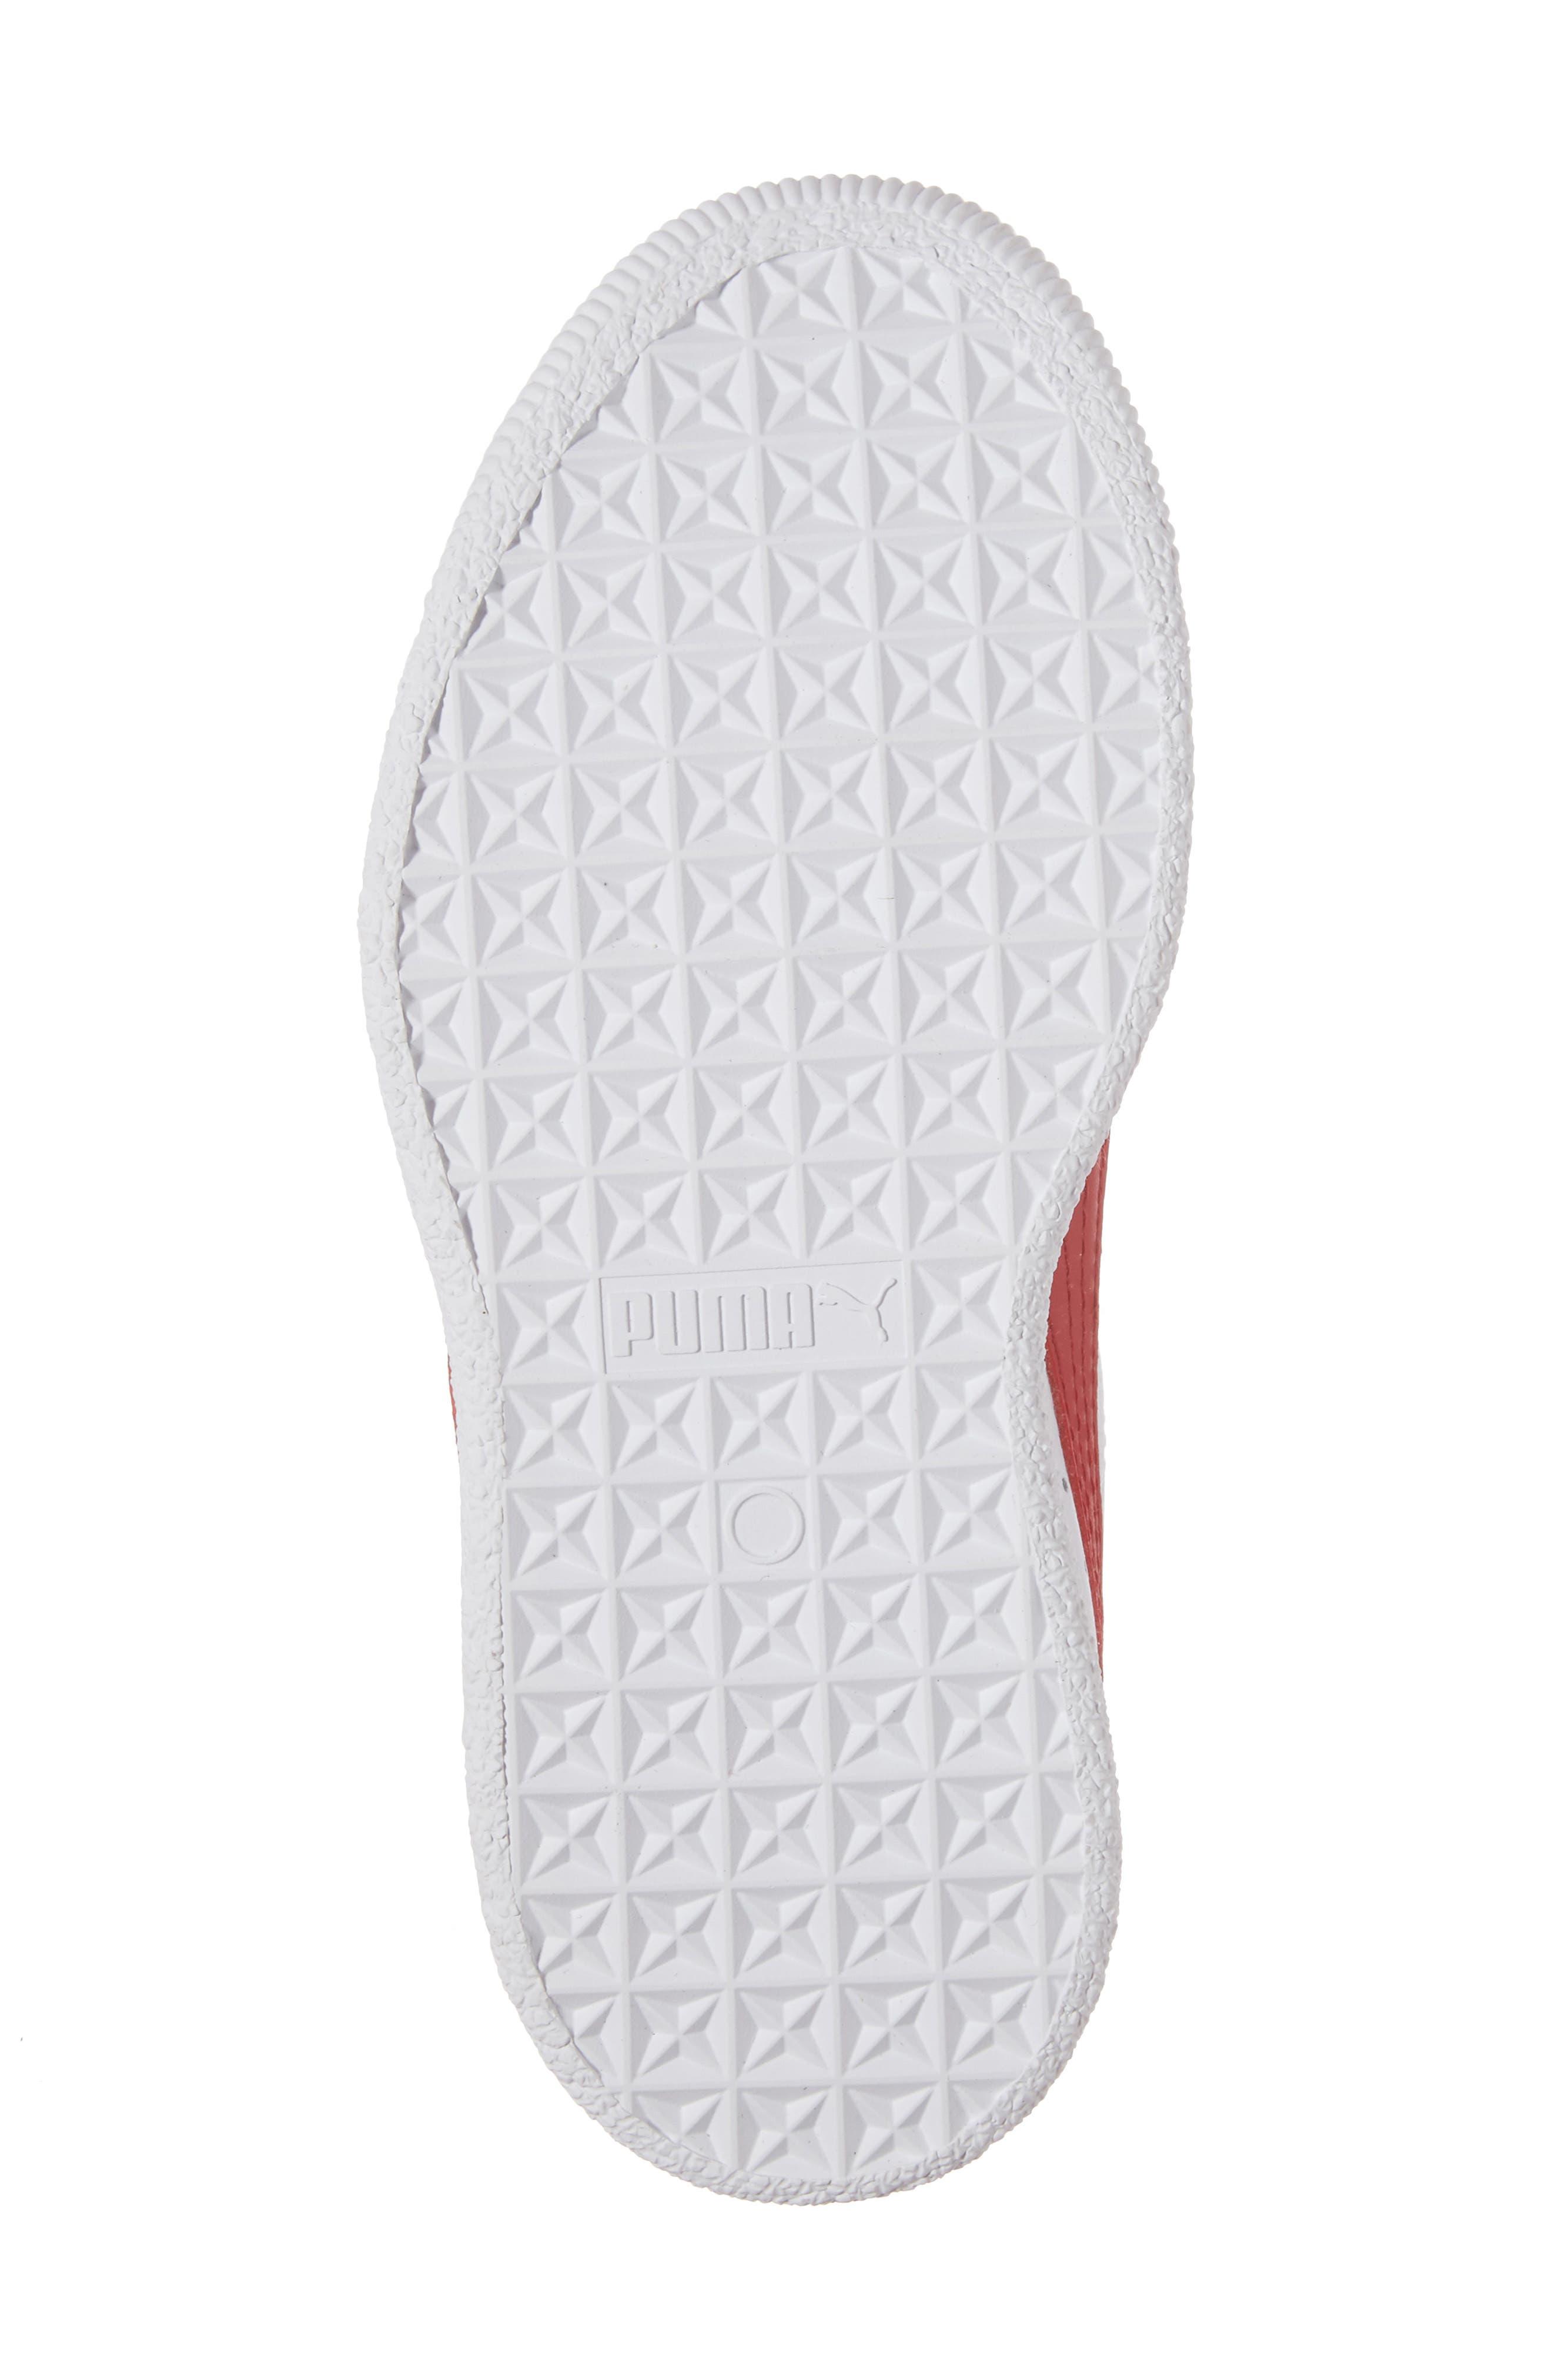 Clyde Core Foil Sneaker,                             Alternate thumbnail 6, color,                             White/ Cherry